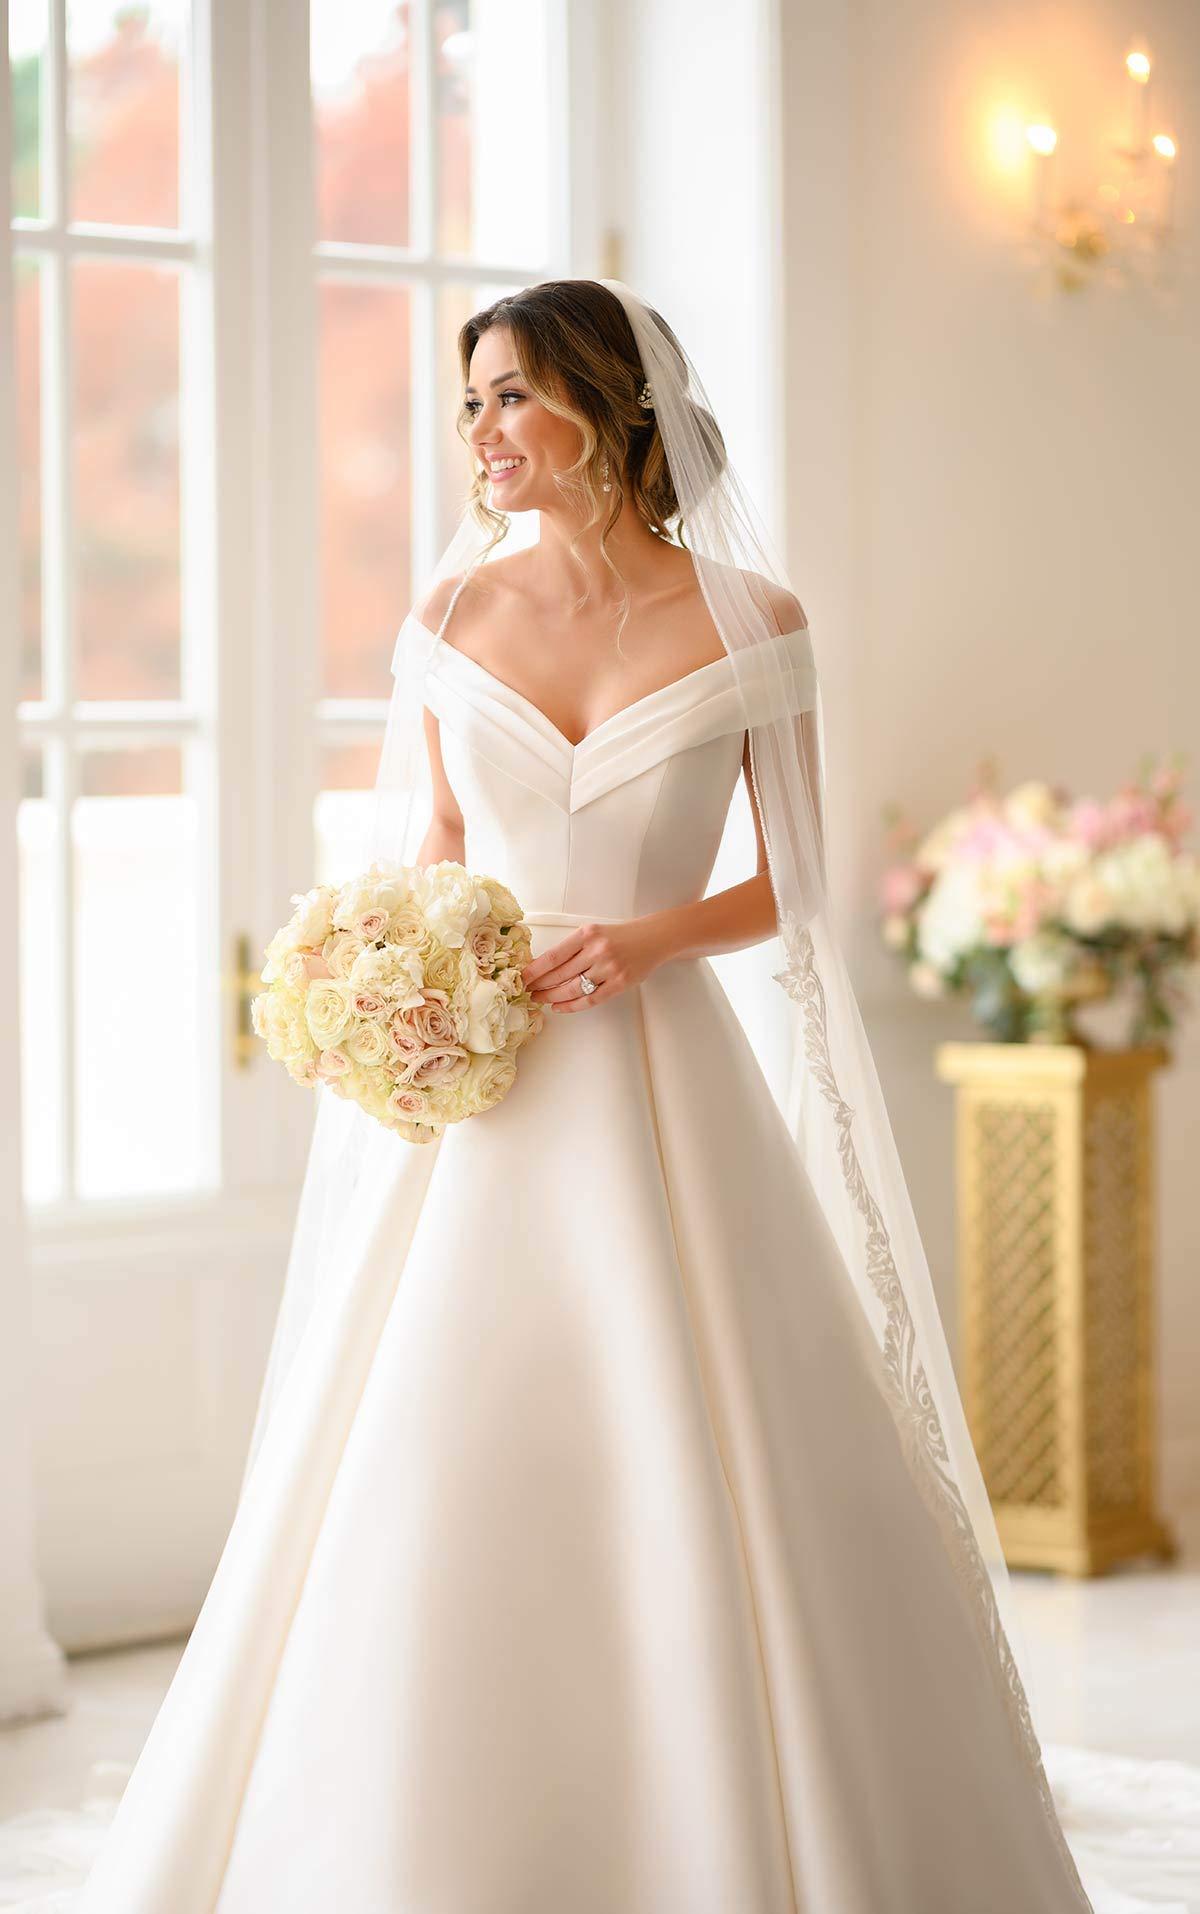 Women S A Line Long Wedding Dress Off The Shoulder Satin Bridal Dresses For Bride